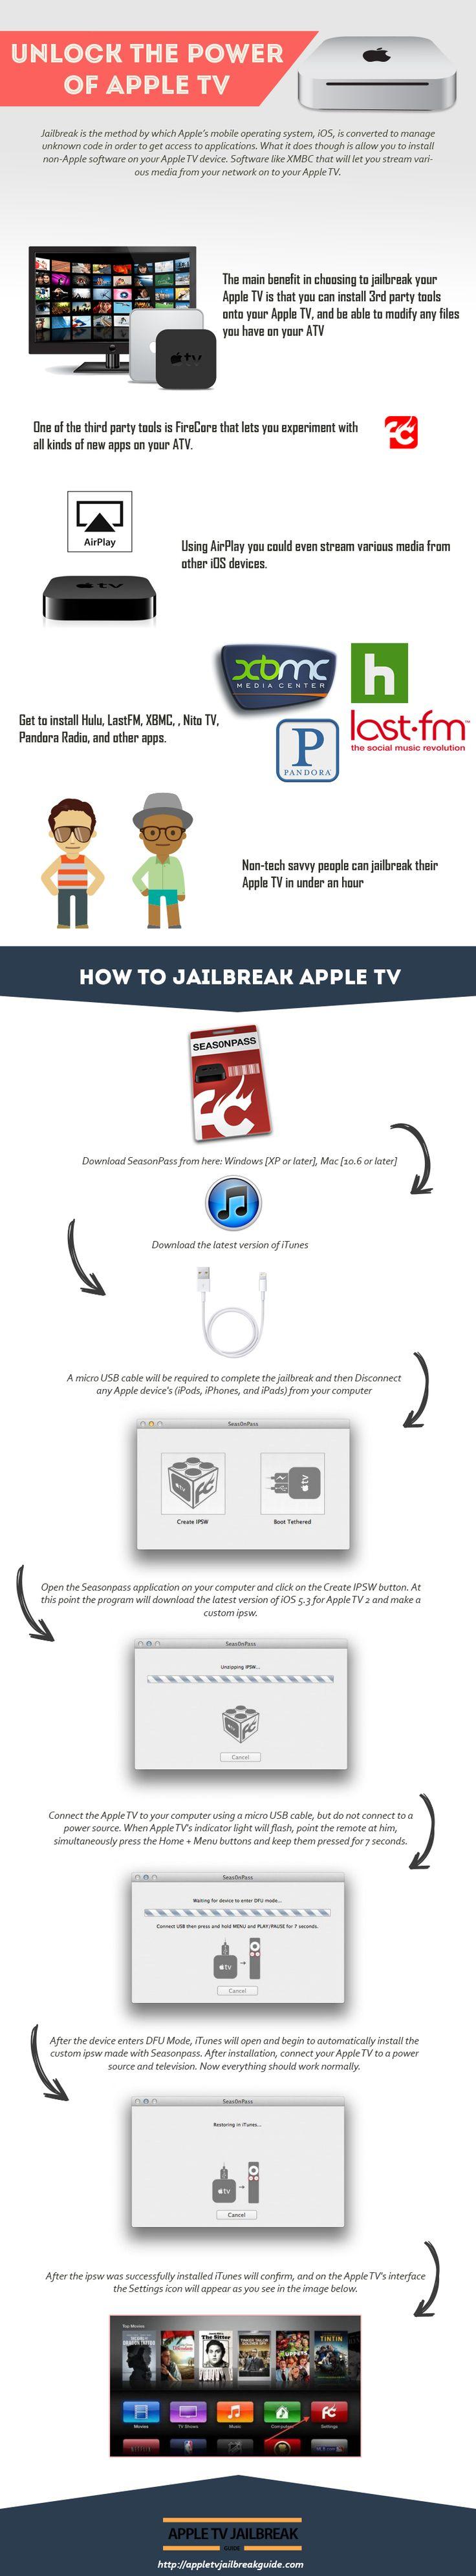 The following infographic pulls together the basics of Apple TV jailbreak process. #apple #atv #jailbreak #hack